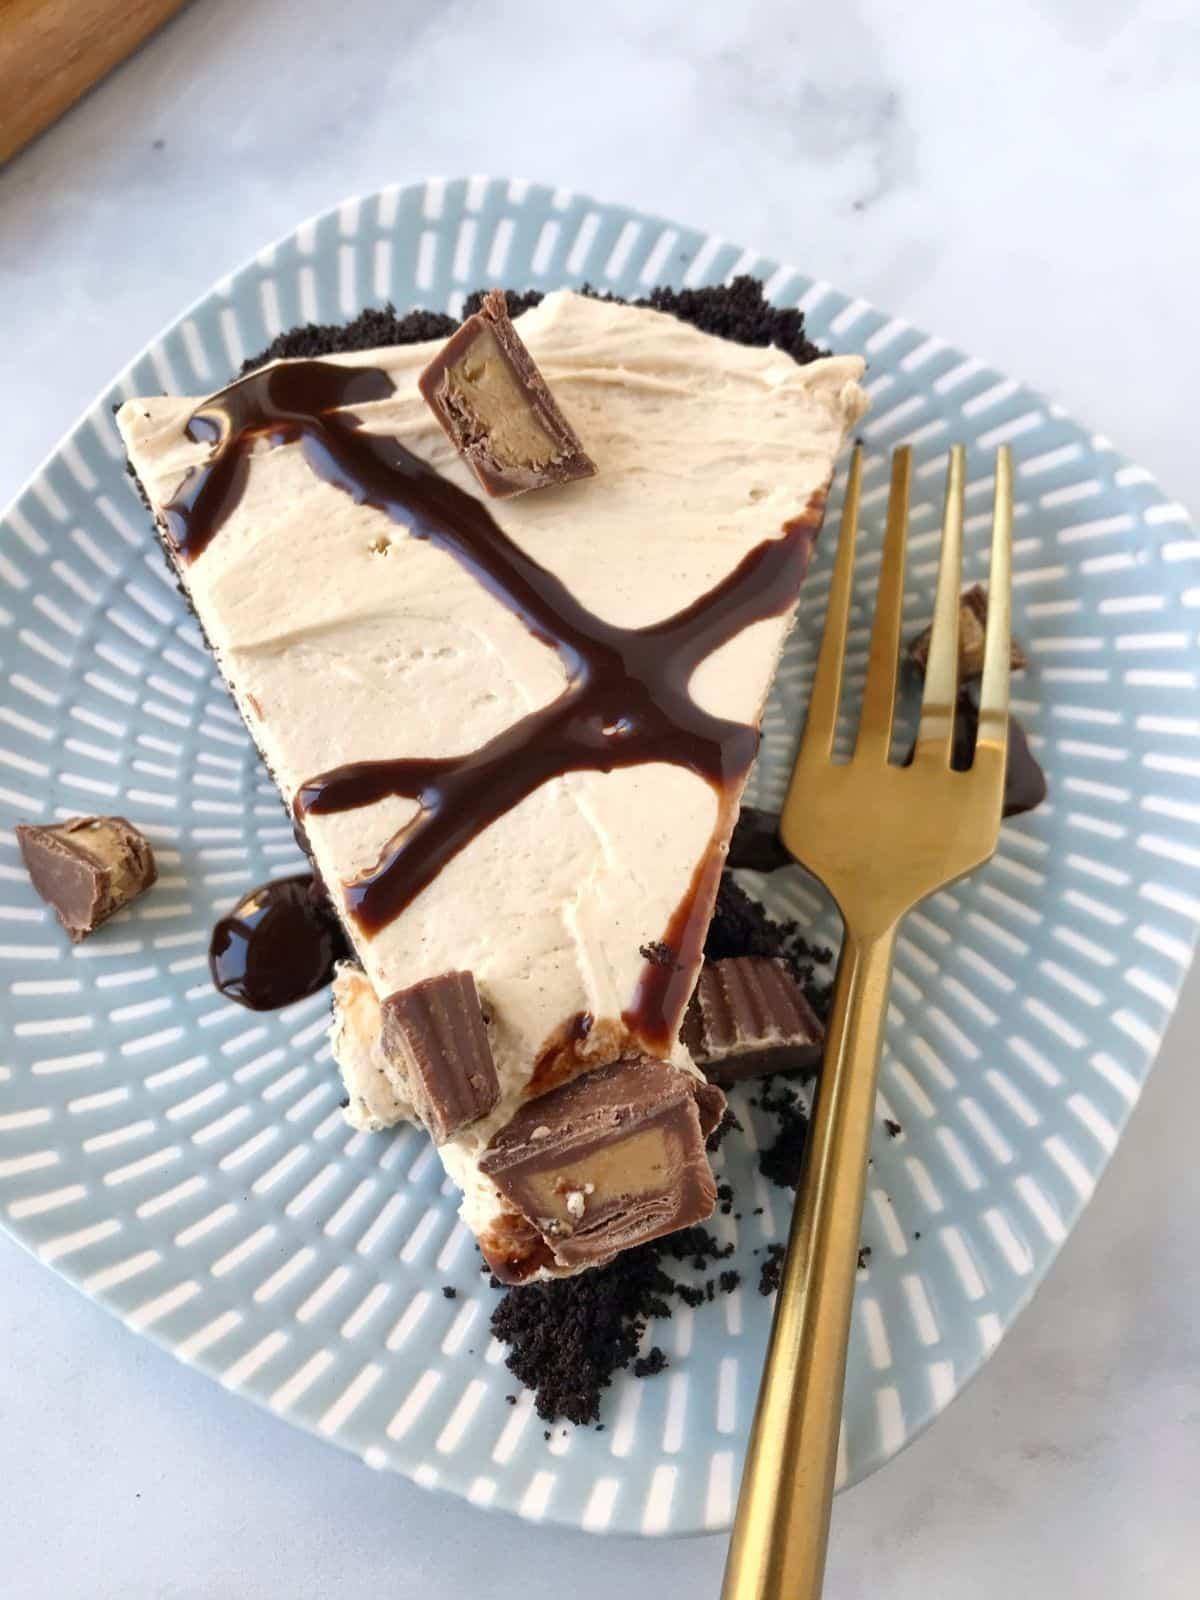 slice of tart on a plate